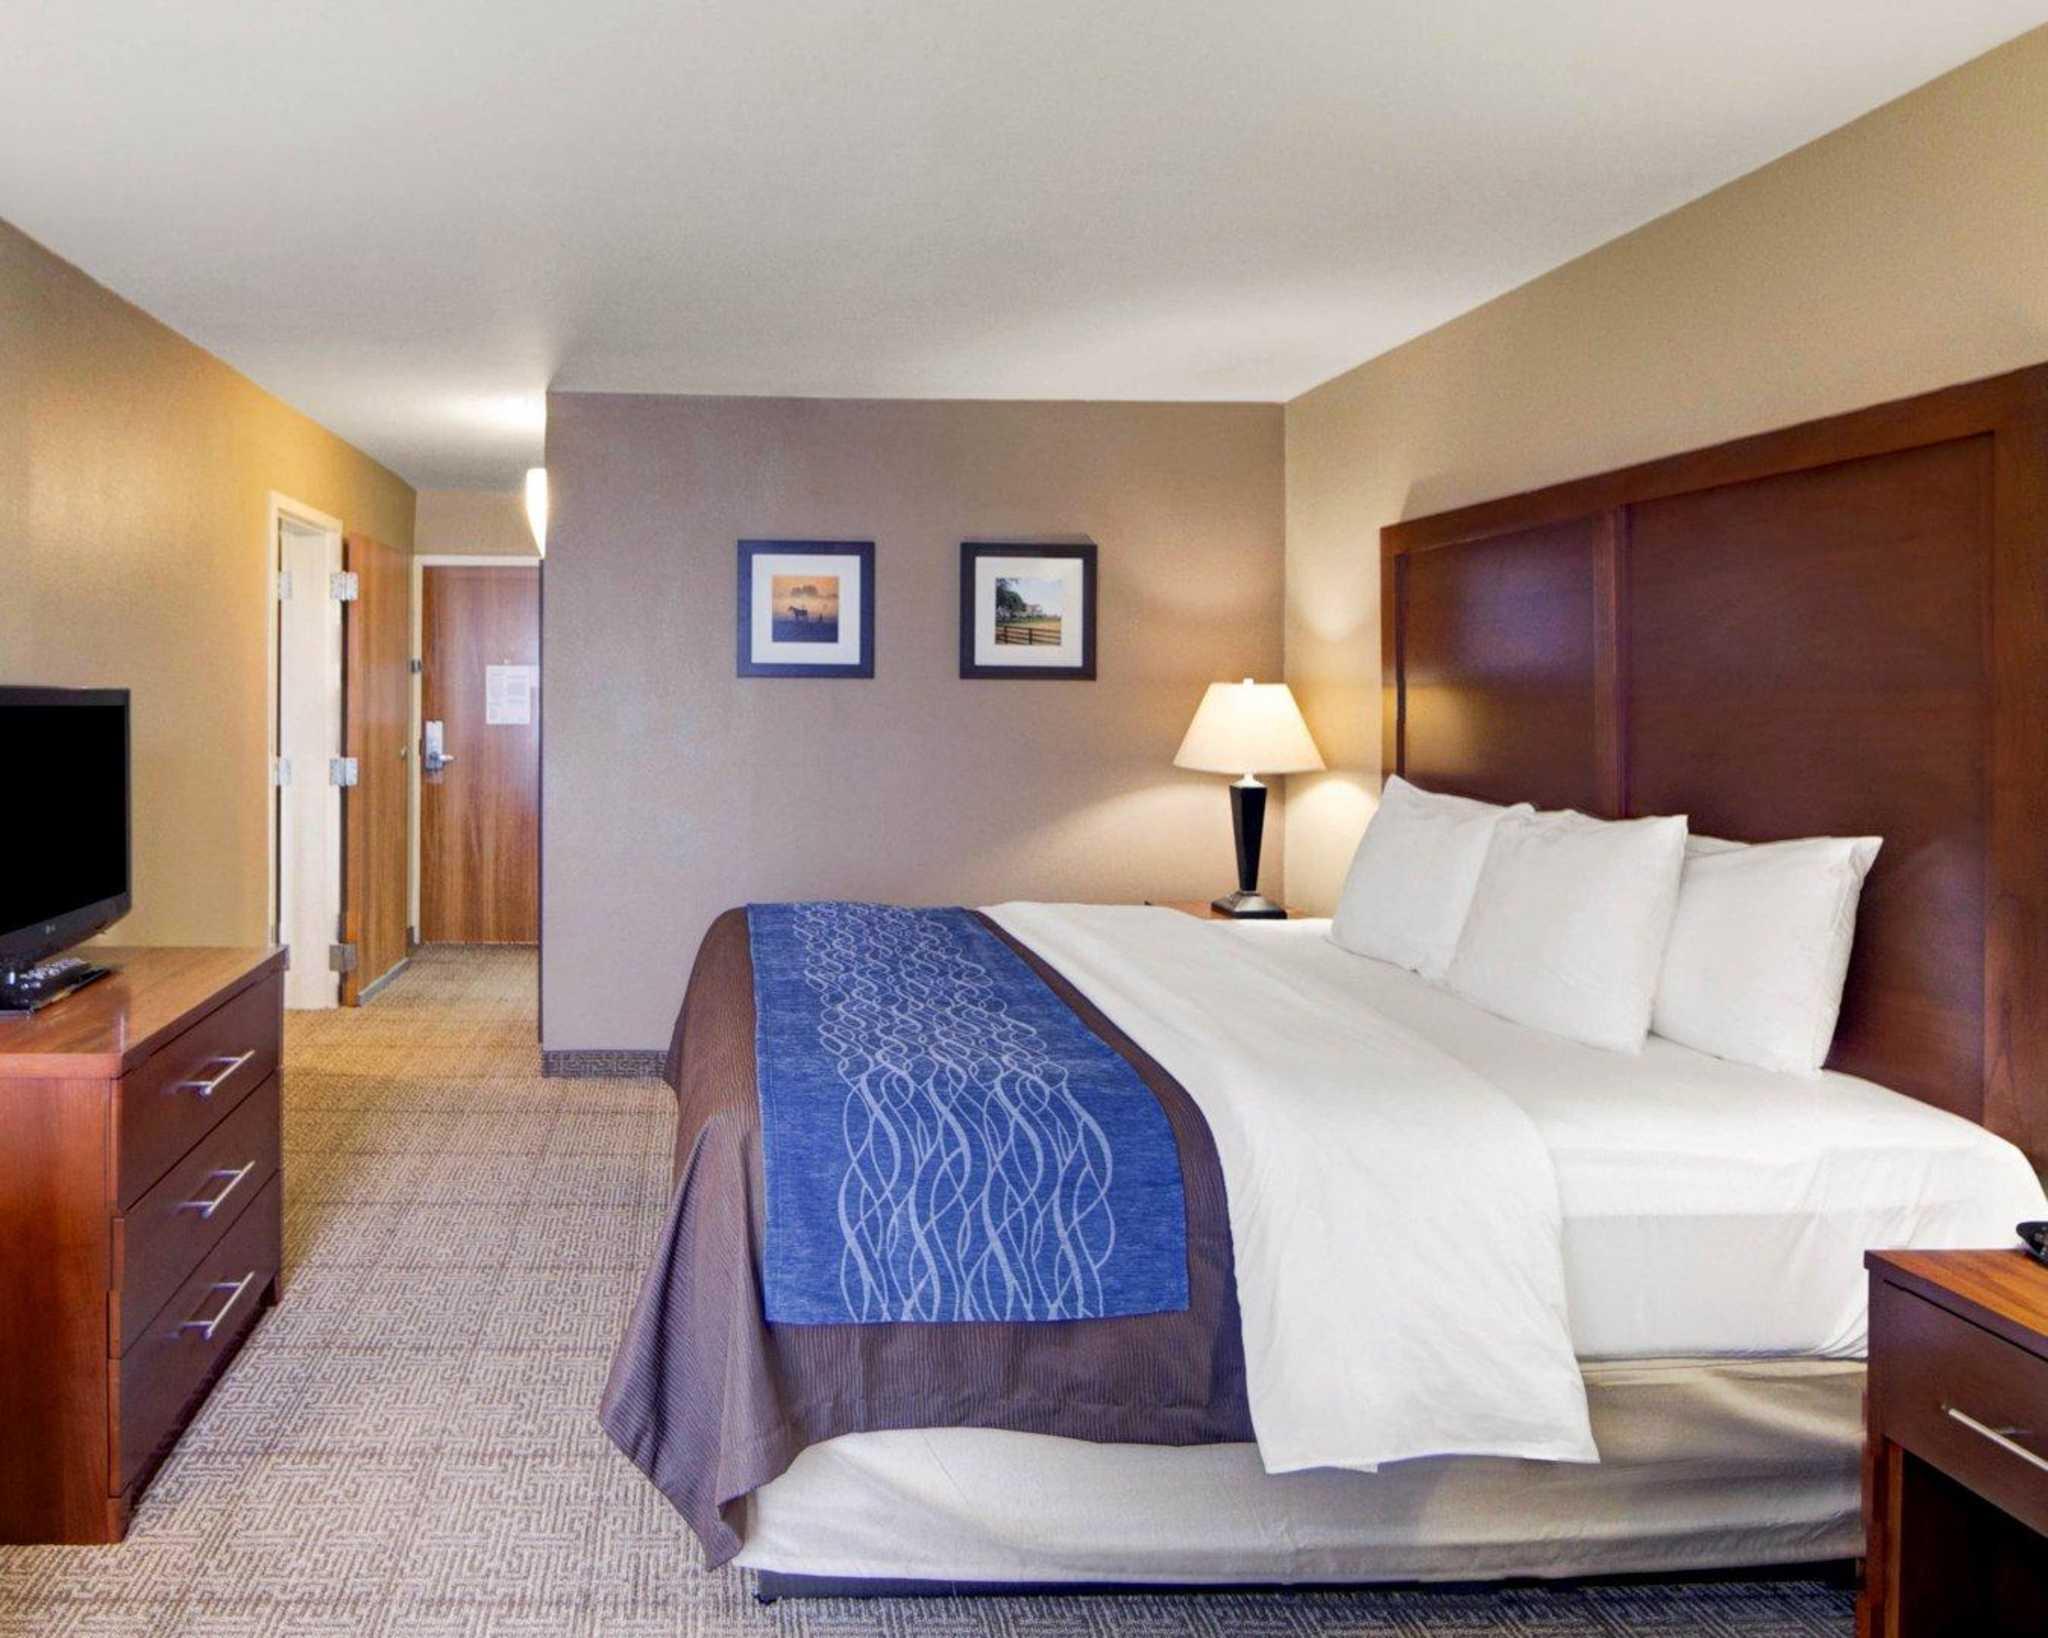 Comfort Inn & Suites Plano East image 5